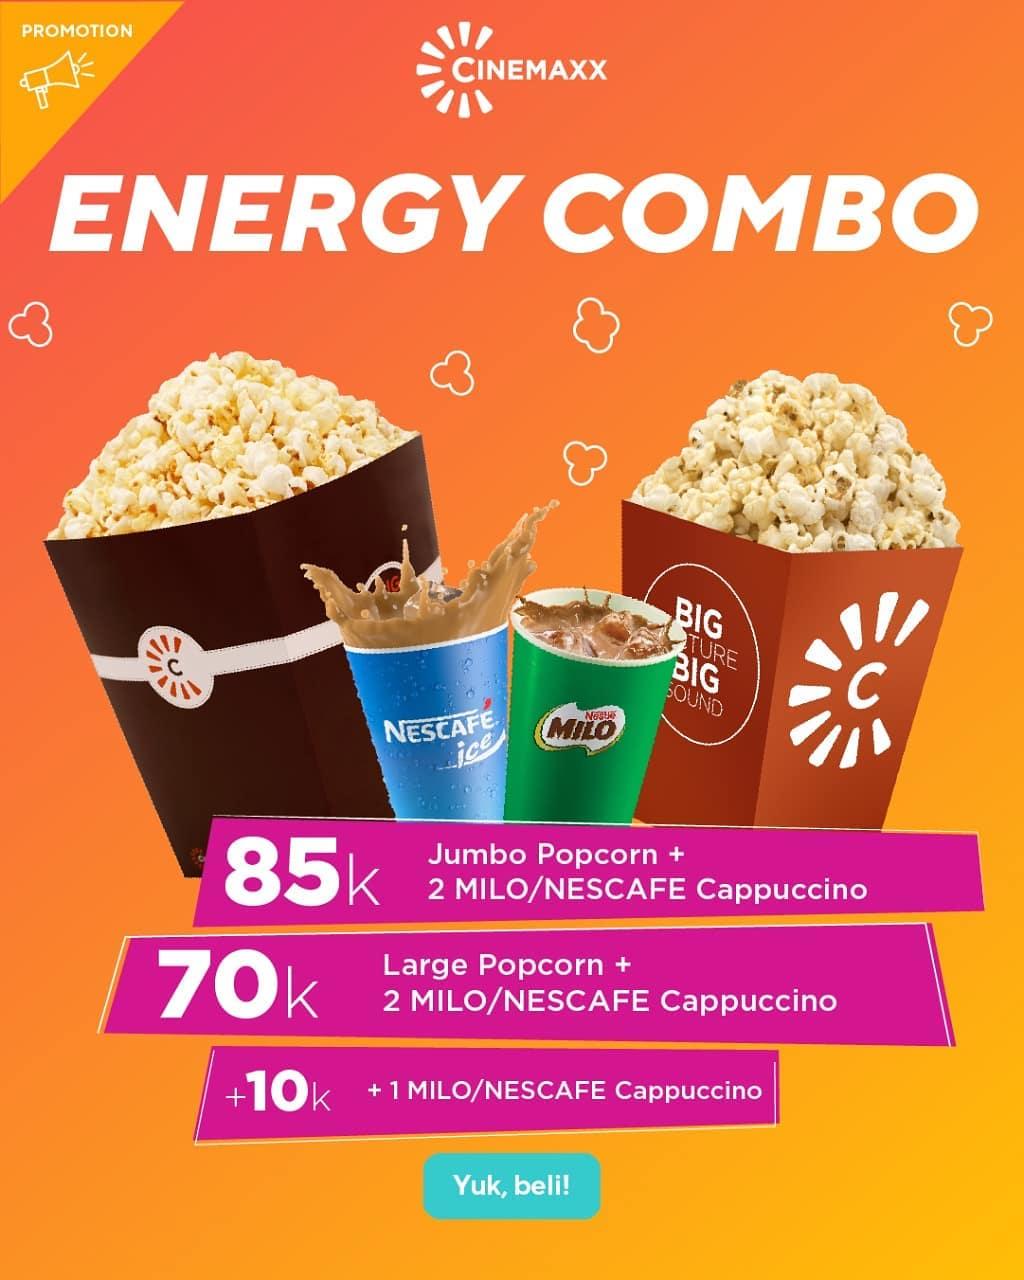 CINEMAXX ENERGY COMBO Paket Popcorn ukuran large + 2 minuman hanya Rp.70.000